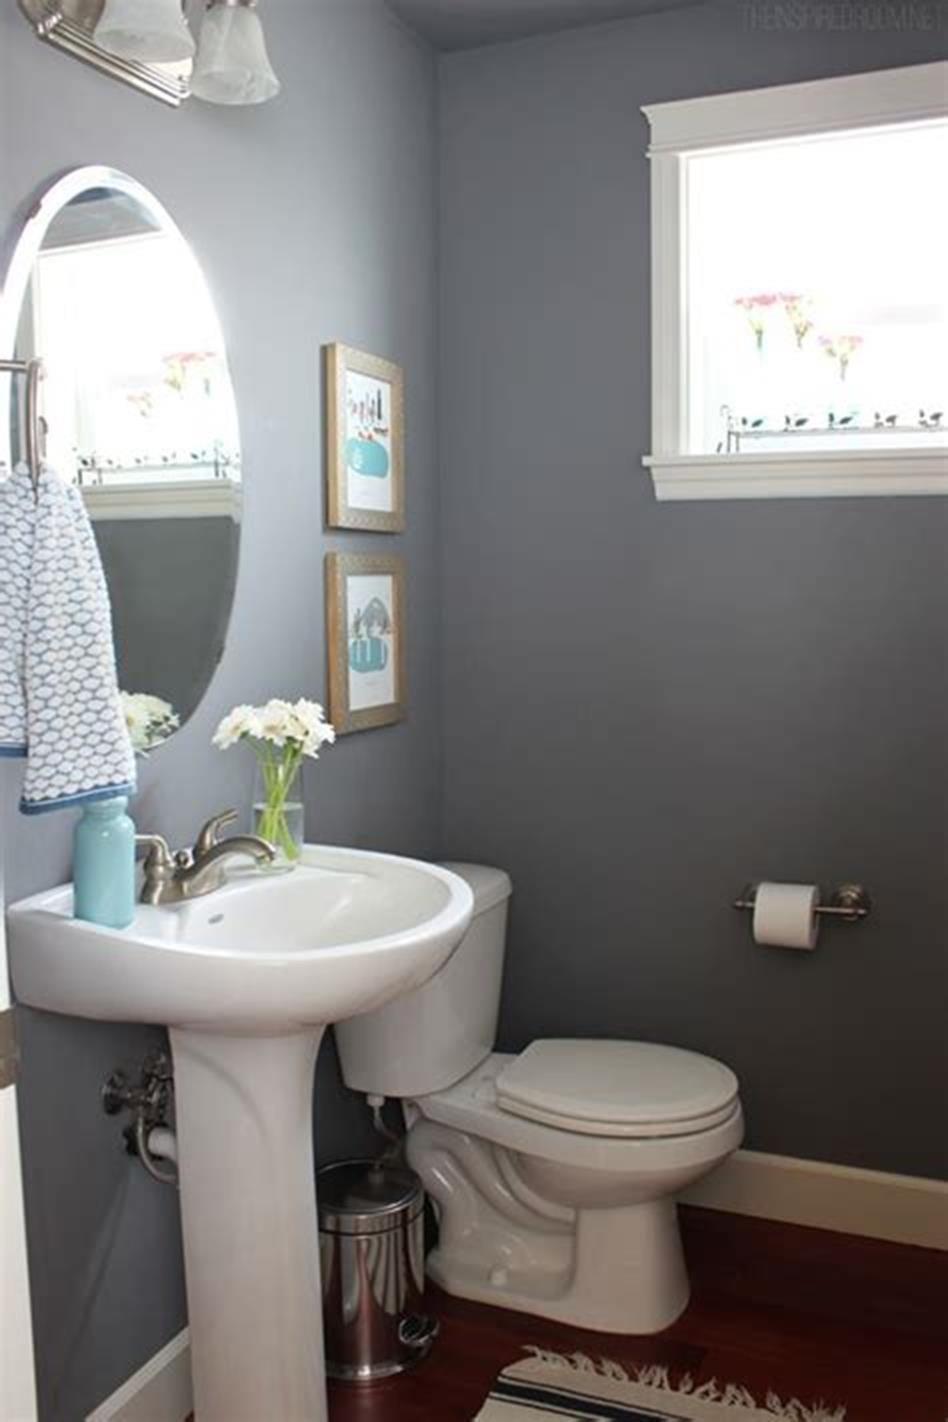 40 Best Color Schemes Bathroom Decorating Ideas On A Budget 2019 47 In 2020 Half Bathroom Decor Bathroom Decor Apartment Diy Bathroom Decor